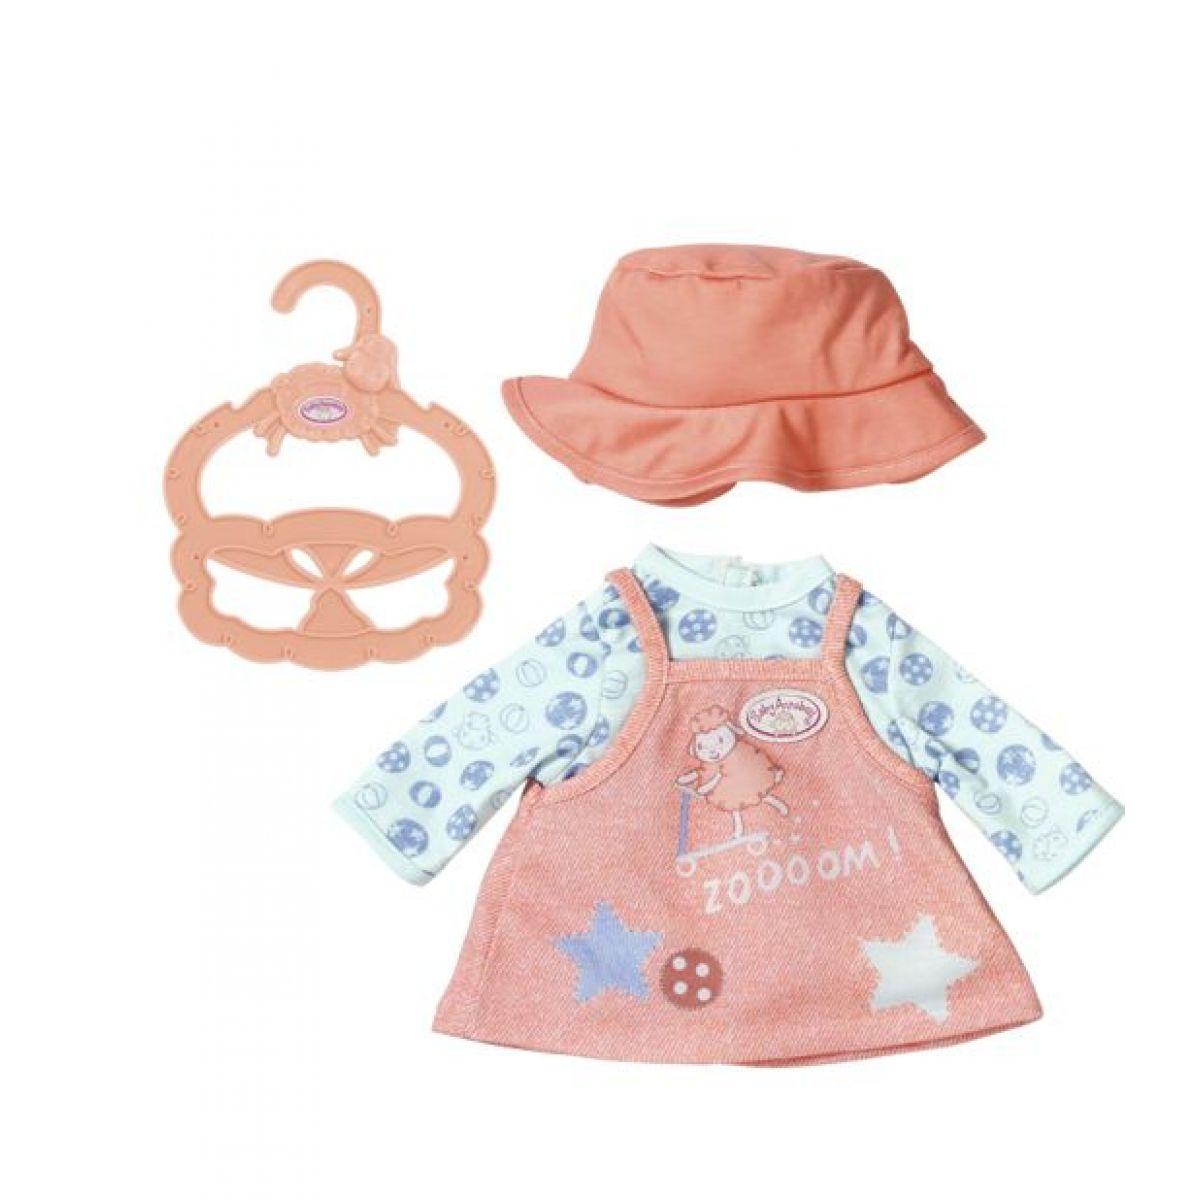 Zapf Creation Baby Annabell Little Baby oblečenie 36 cm 1